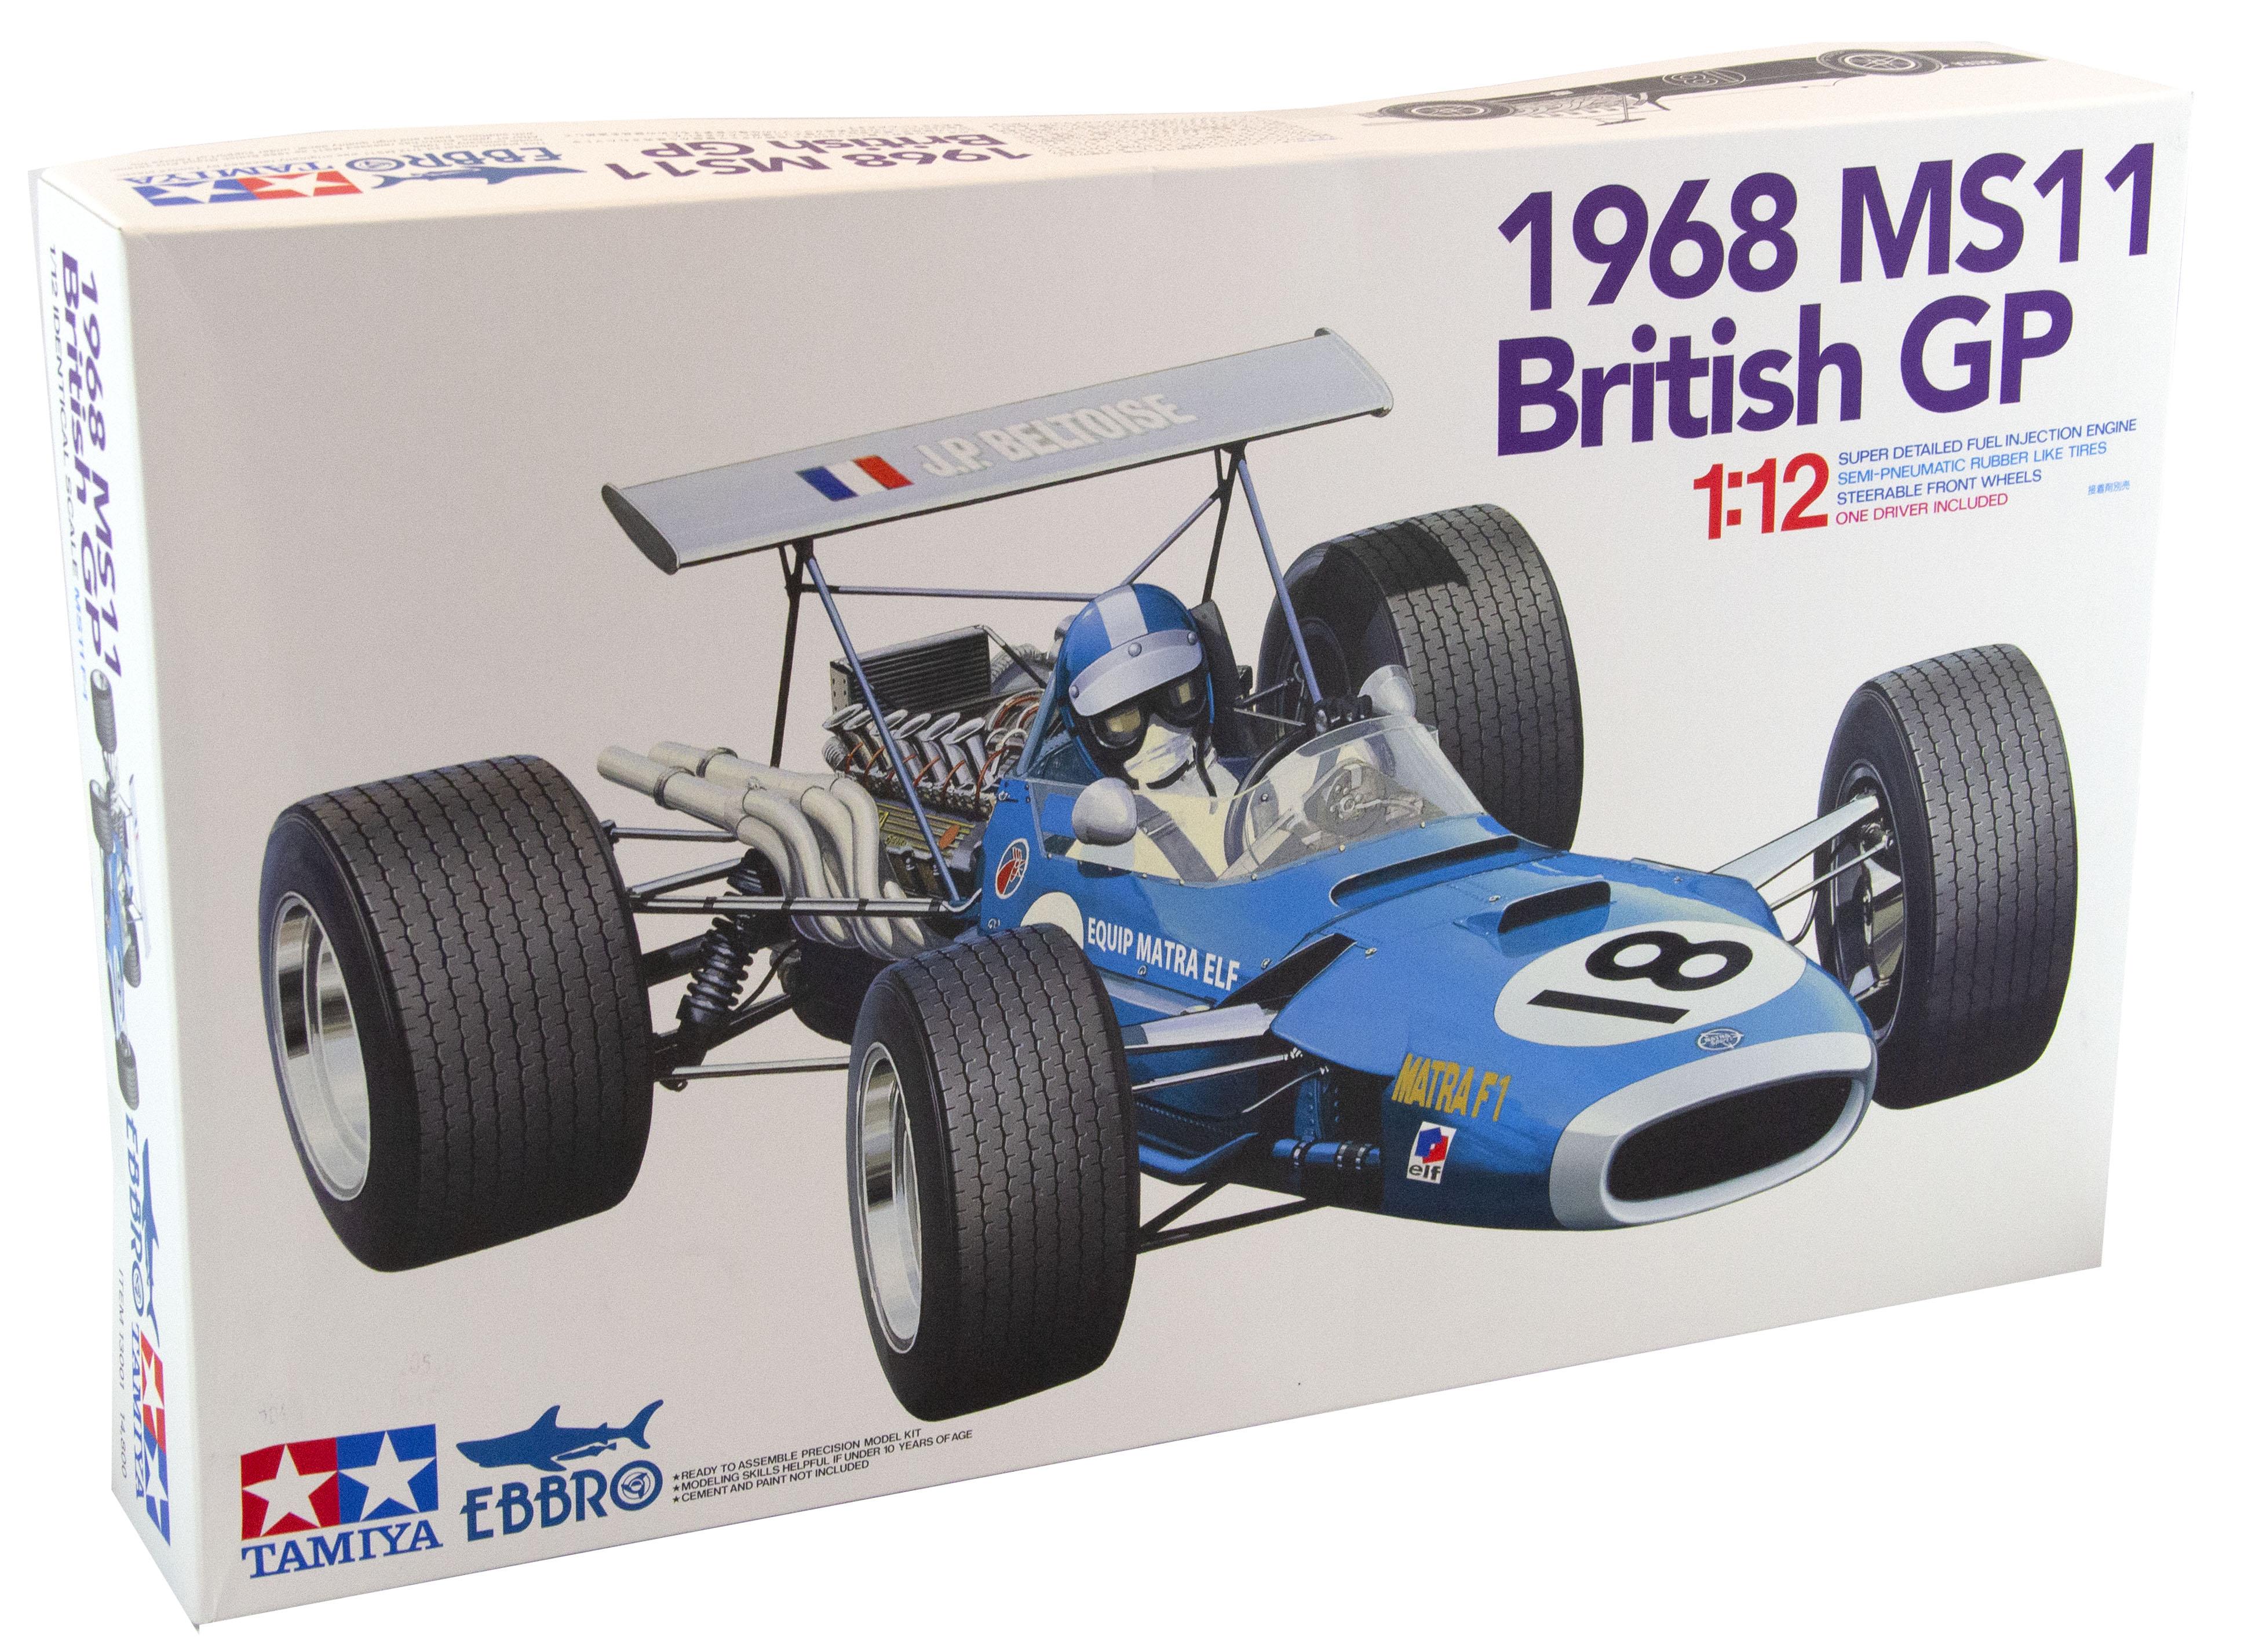 KIT F1 MANTRA MS11 BRITISH GP 1968 - 1/12